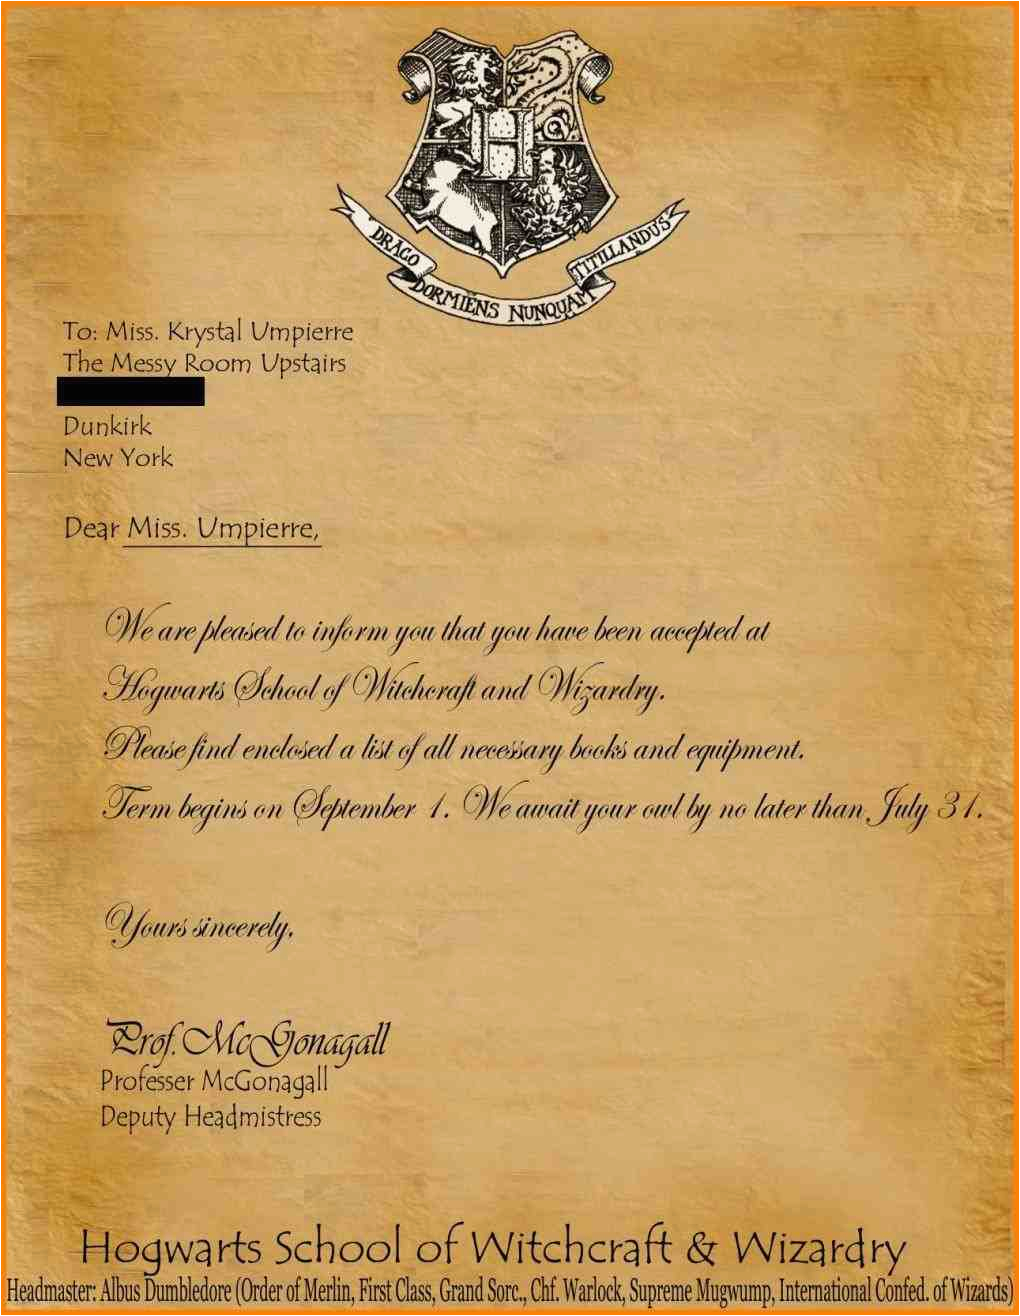 Hogwarts Birthday Invitation Template Harry Potter Envelope Mayamokacomm